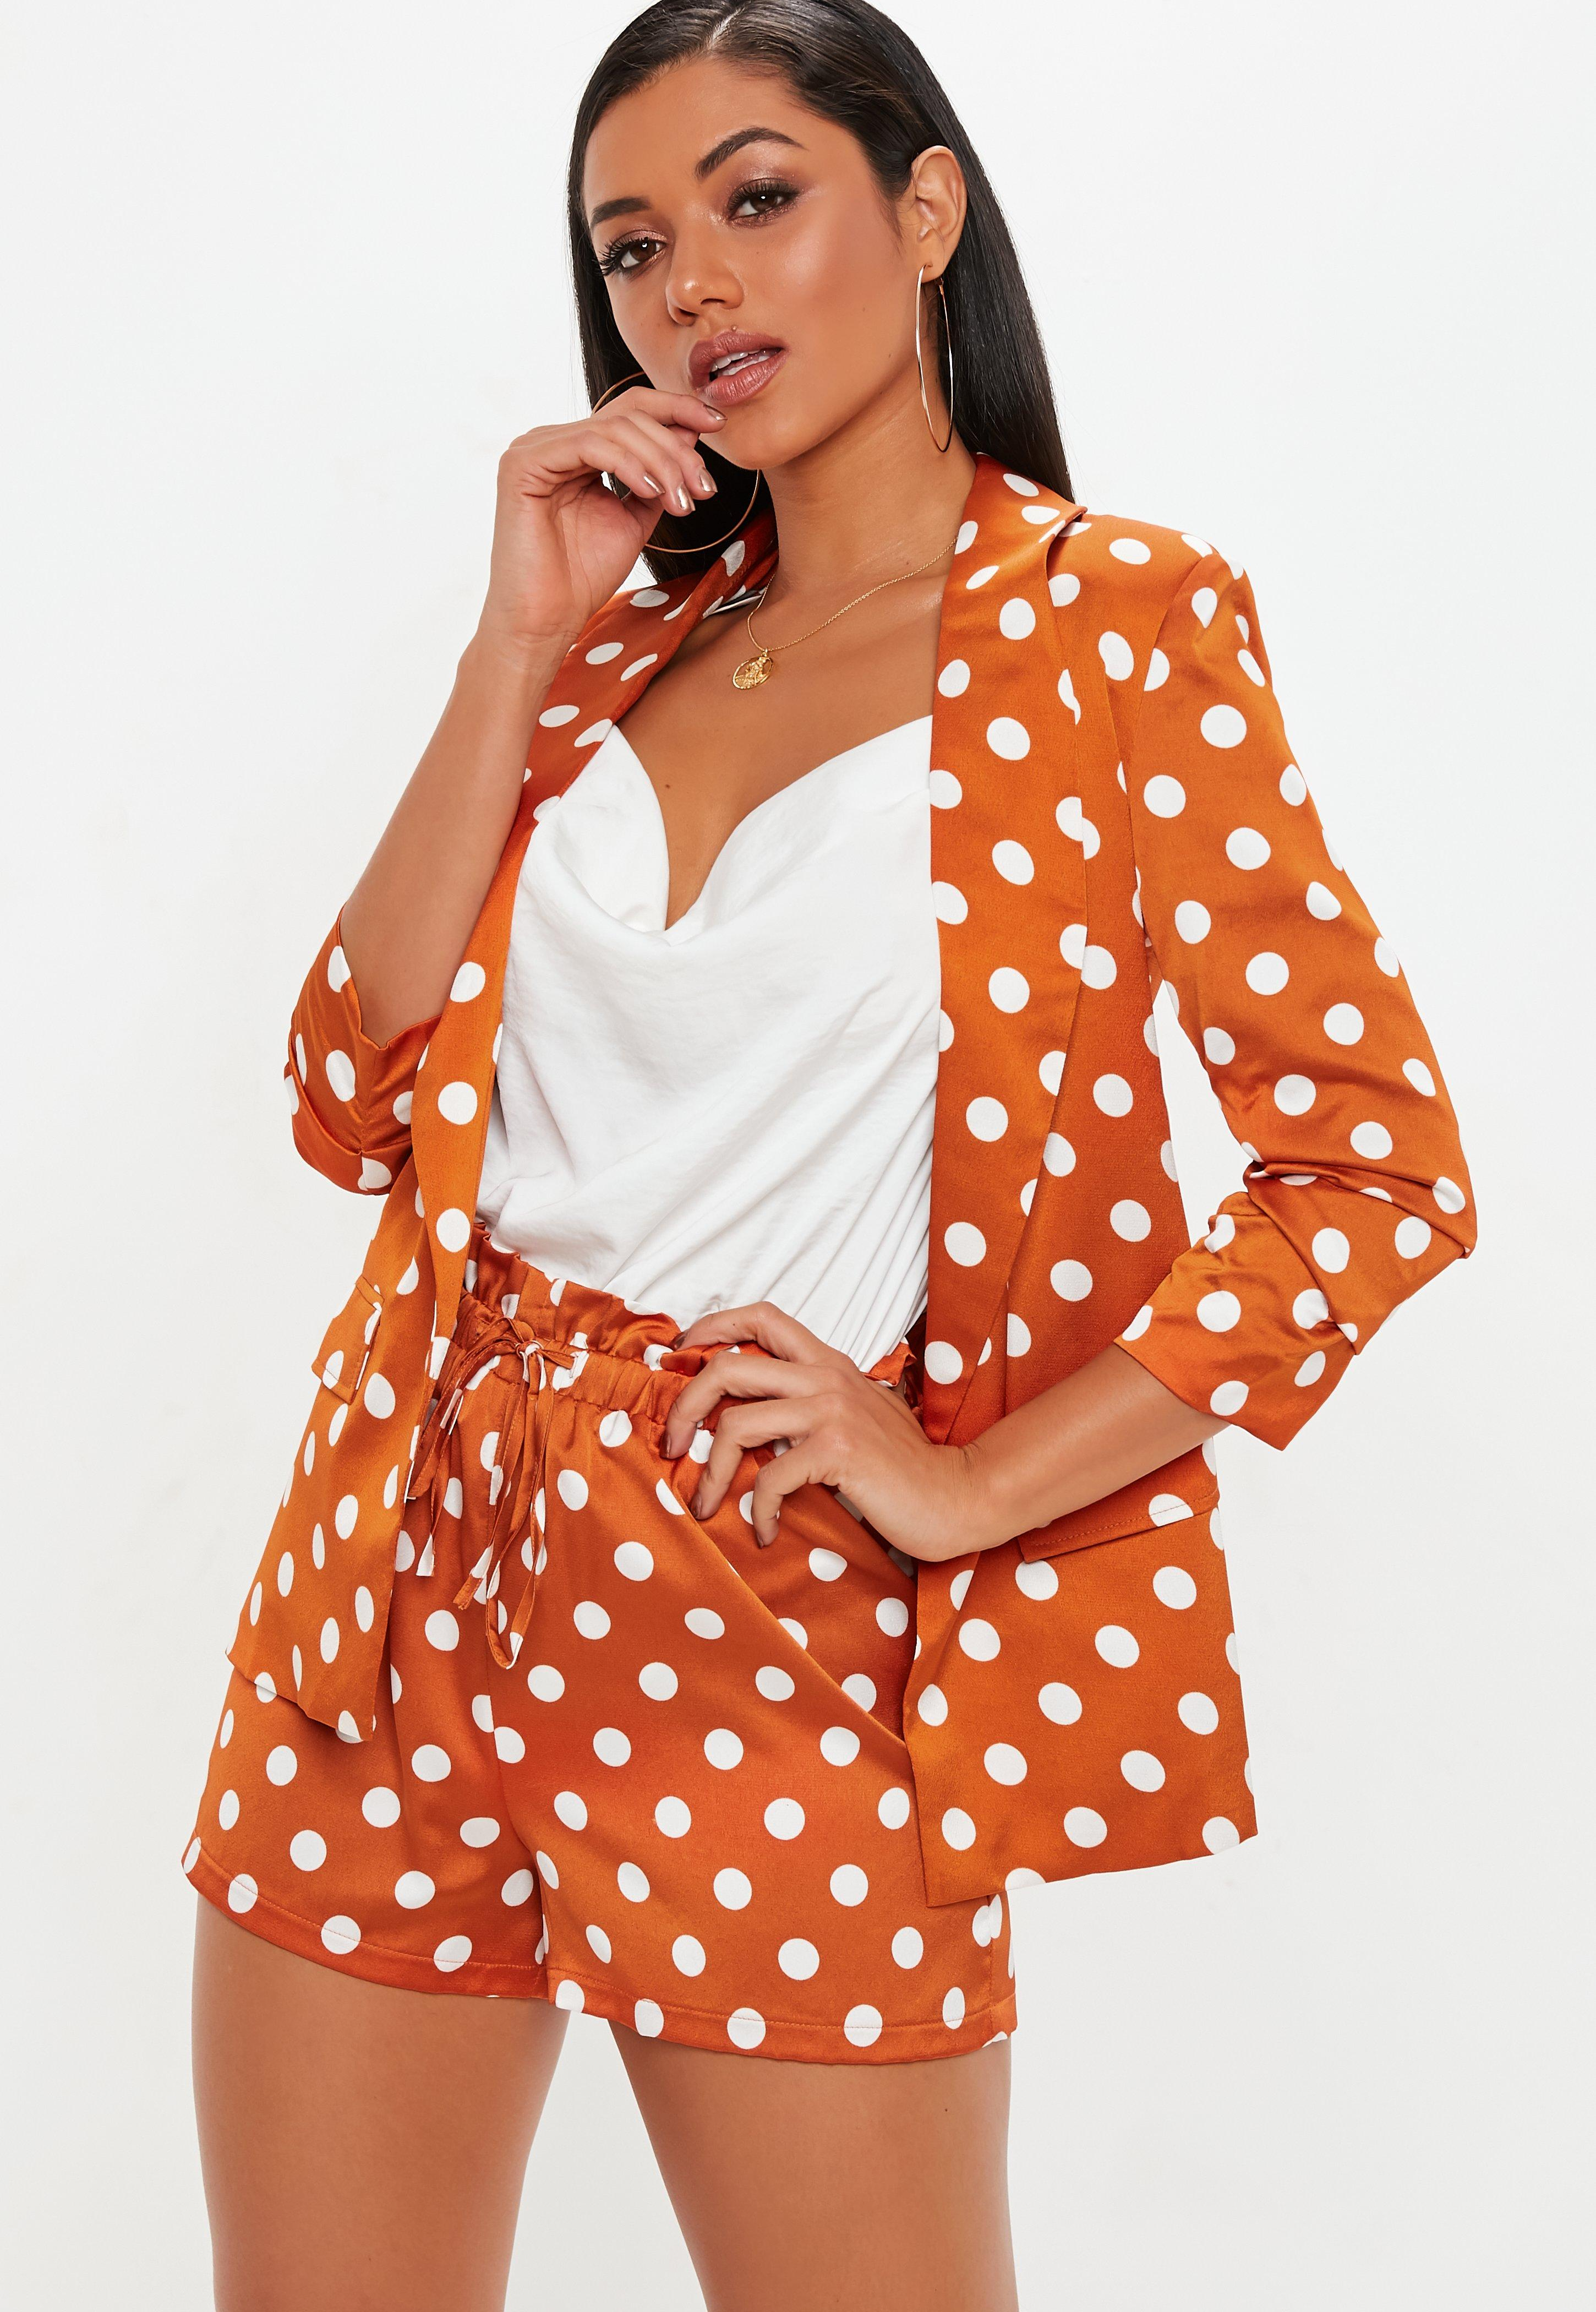 Polka Dot Shorts - Black Missguided Manchester Cheap Price JJ87Dxd